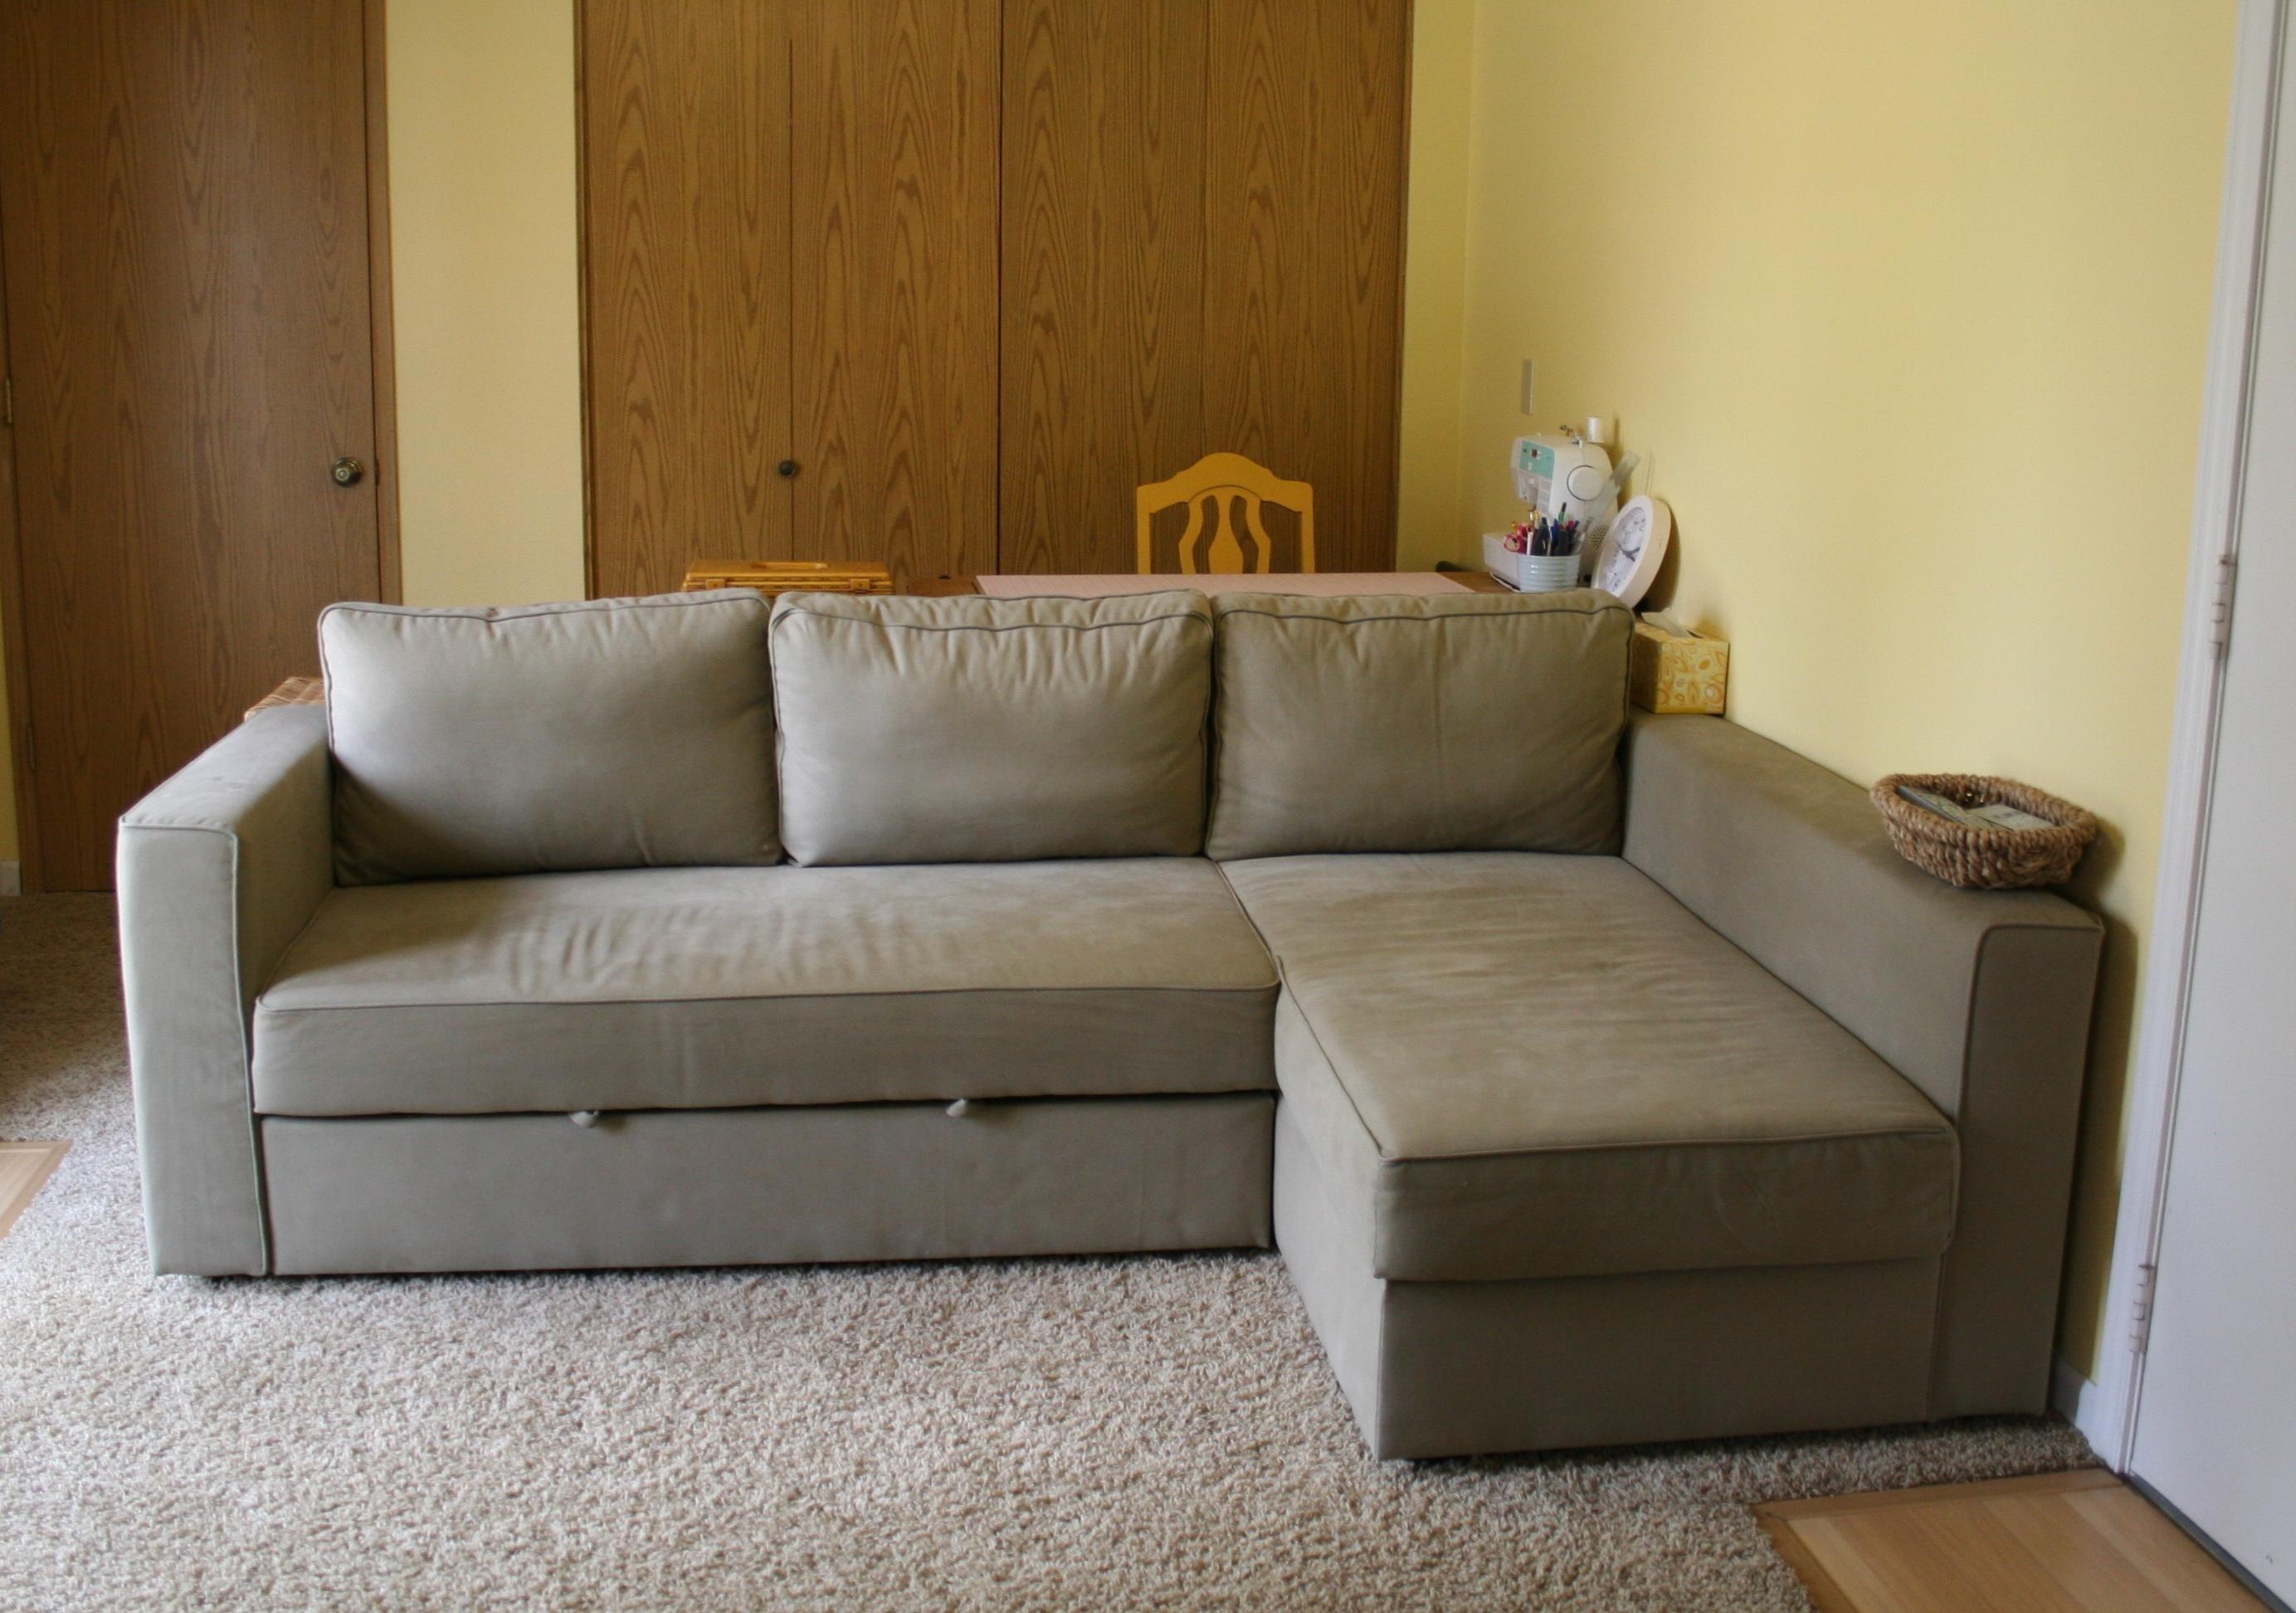 Furniture: Ikea Sofa Bed | Ikea Sofa Beds | Corner Sofa Bed Ikea In Cheap Corner Sofa Beds (View 12 of 20)